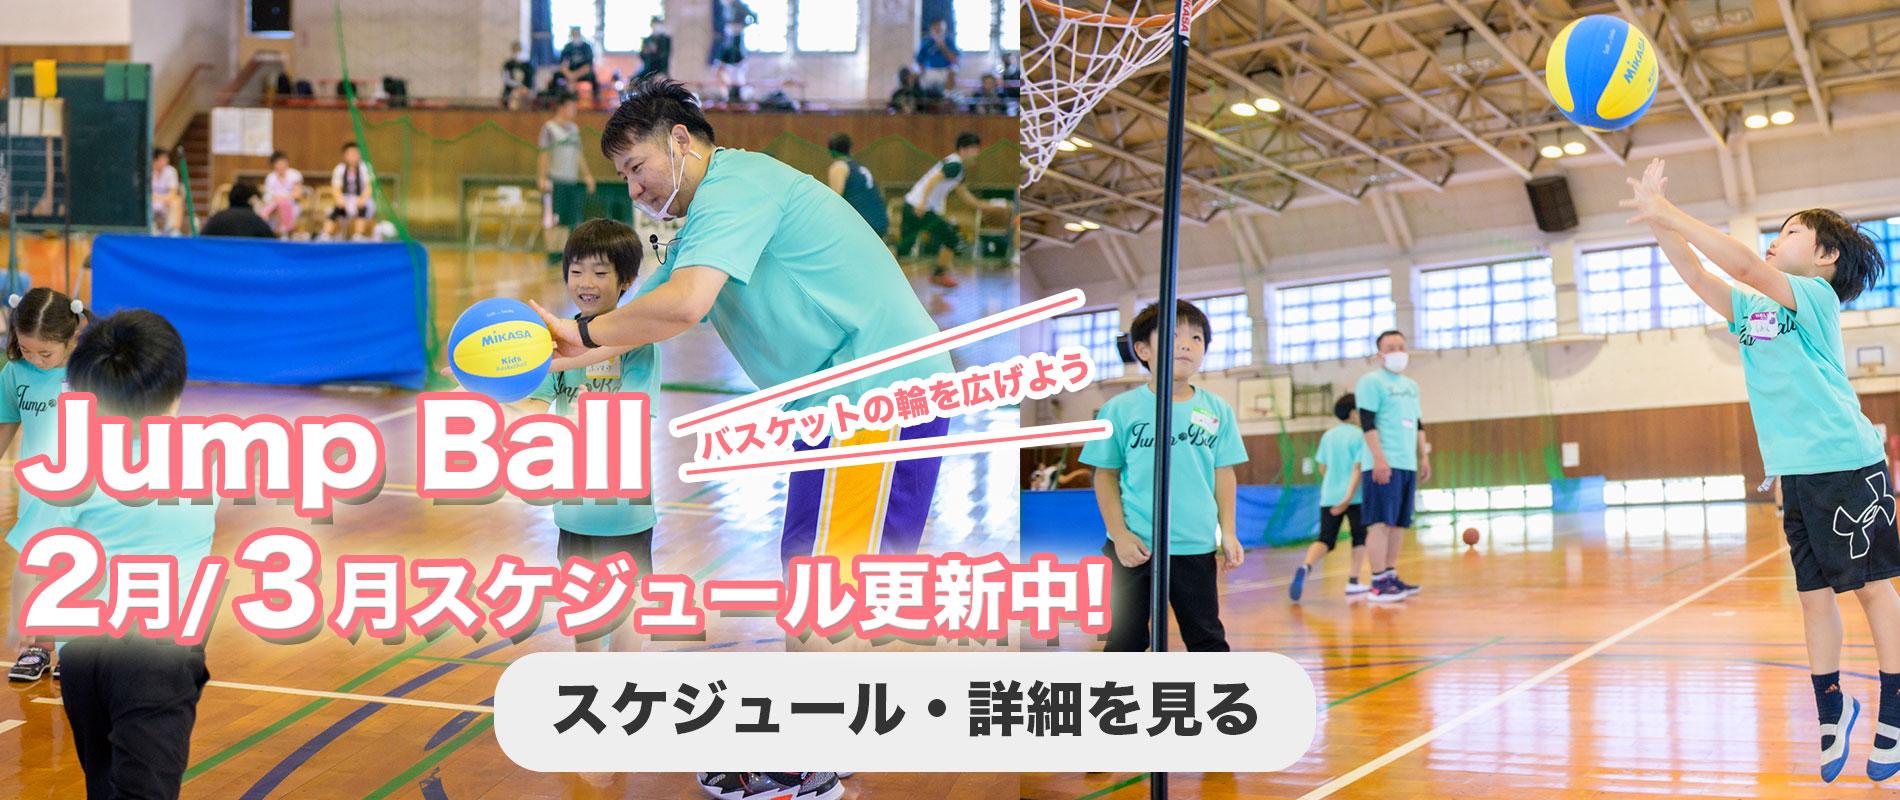 jumpball体験会